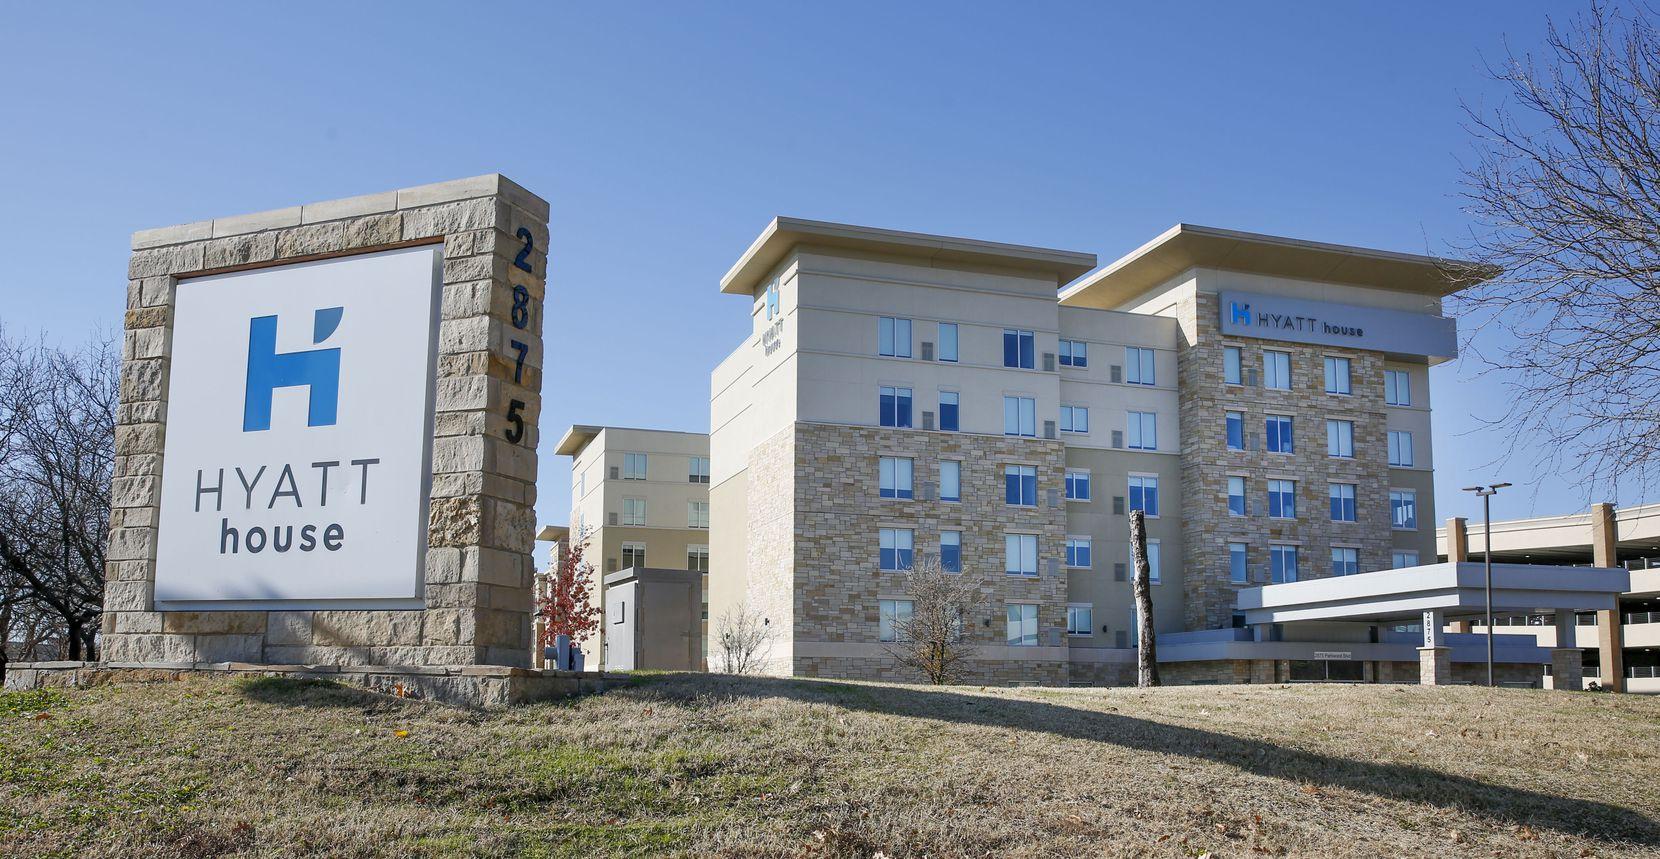 The Hyatt House Frisco is part of Lewisville-based NewcrestImage's portfolio.